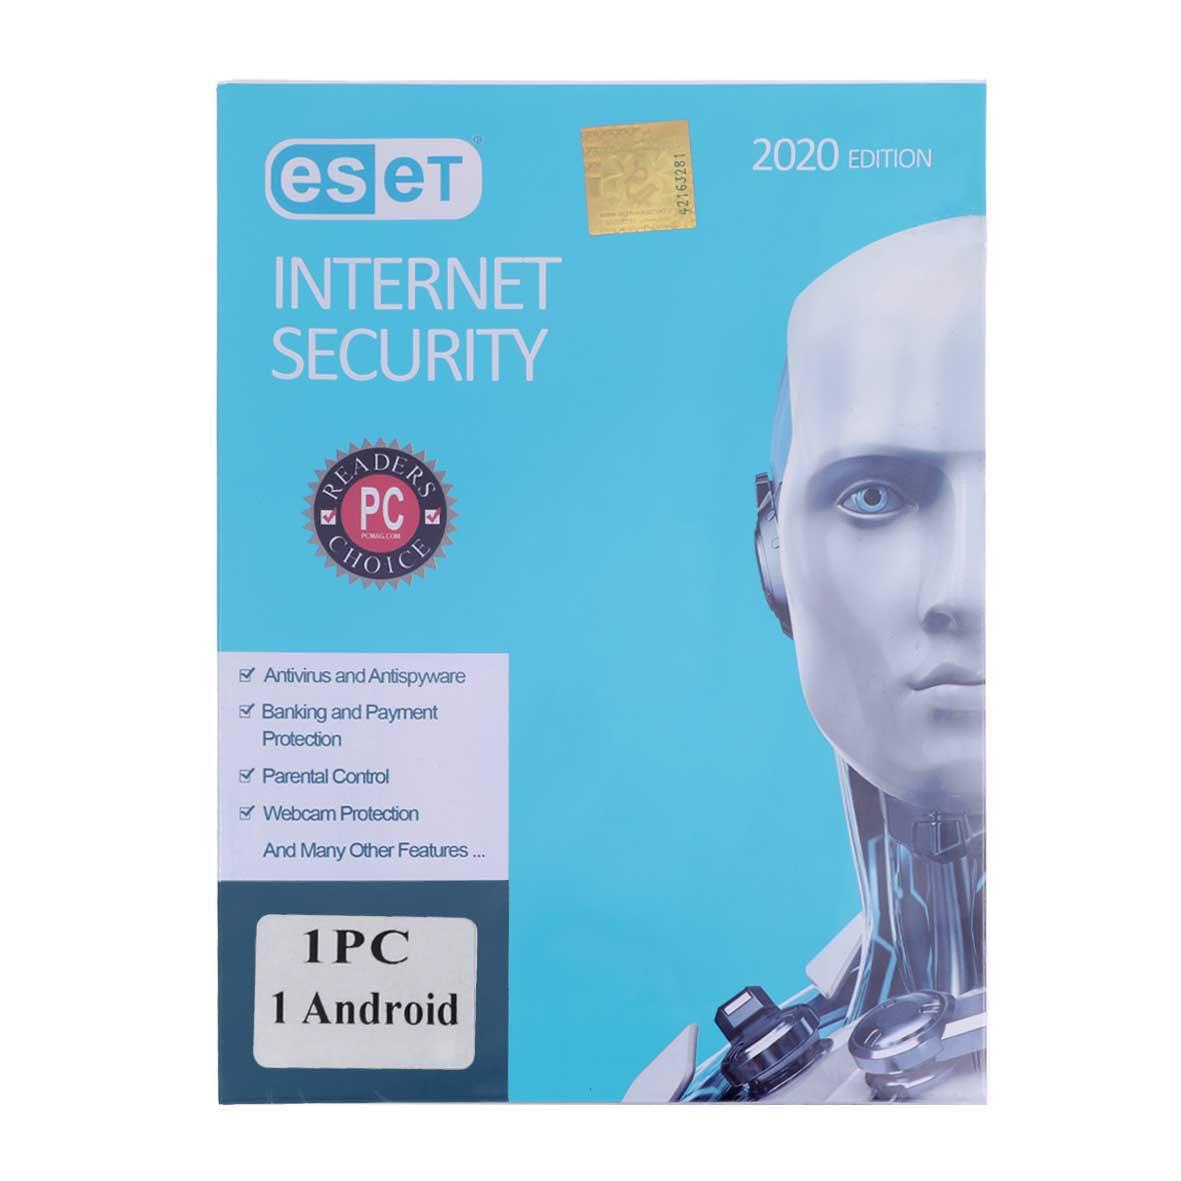 آنتی ویروس ESET INTERNET Security 2020 EDITION -اورجینال (1PC+1Android)